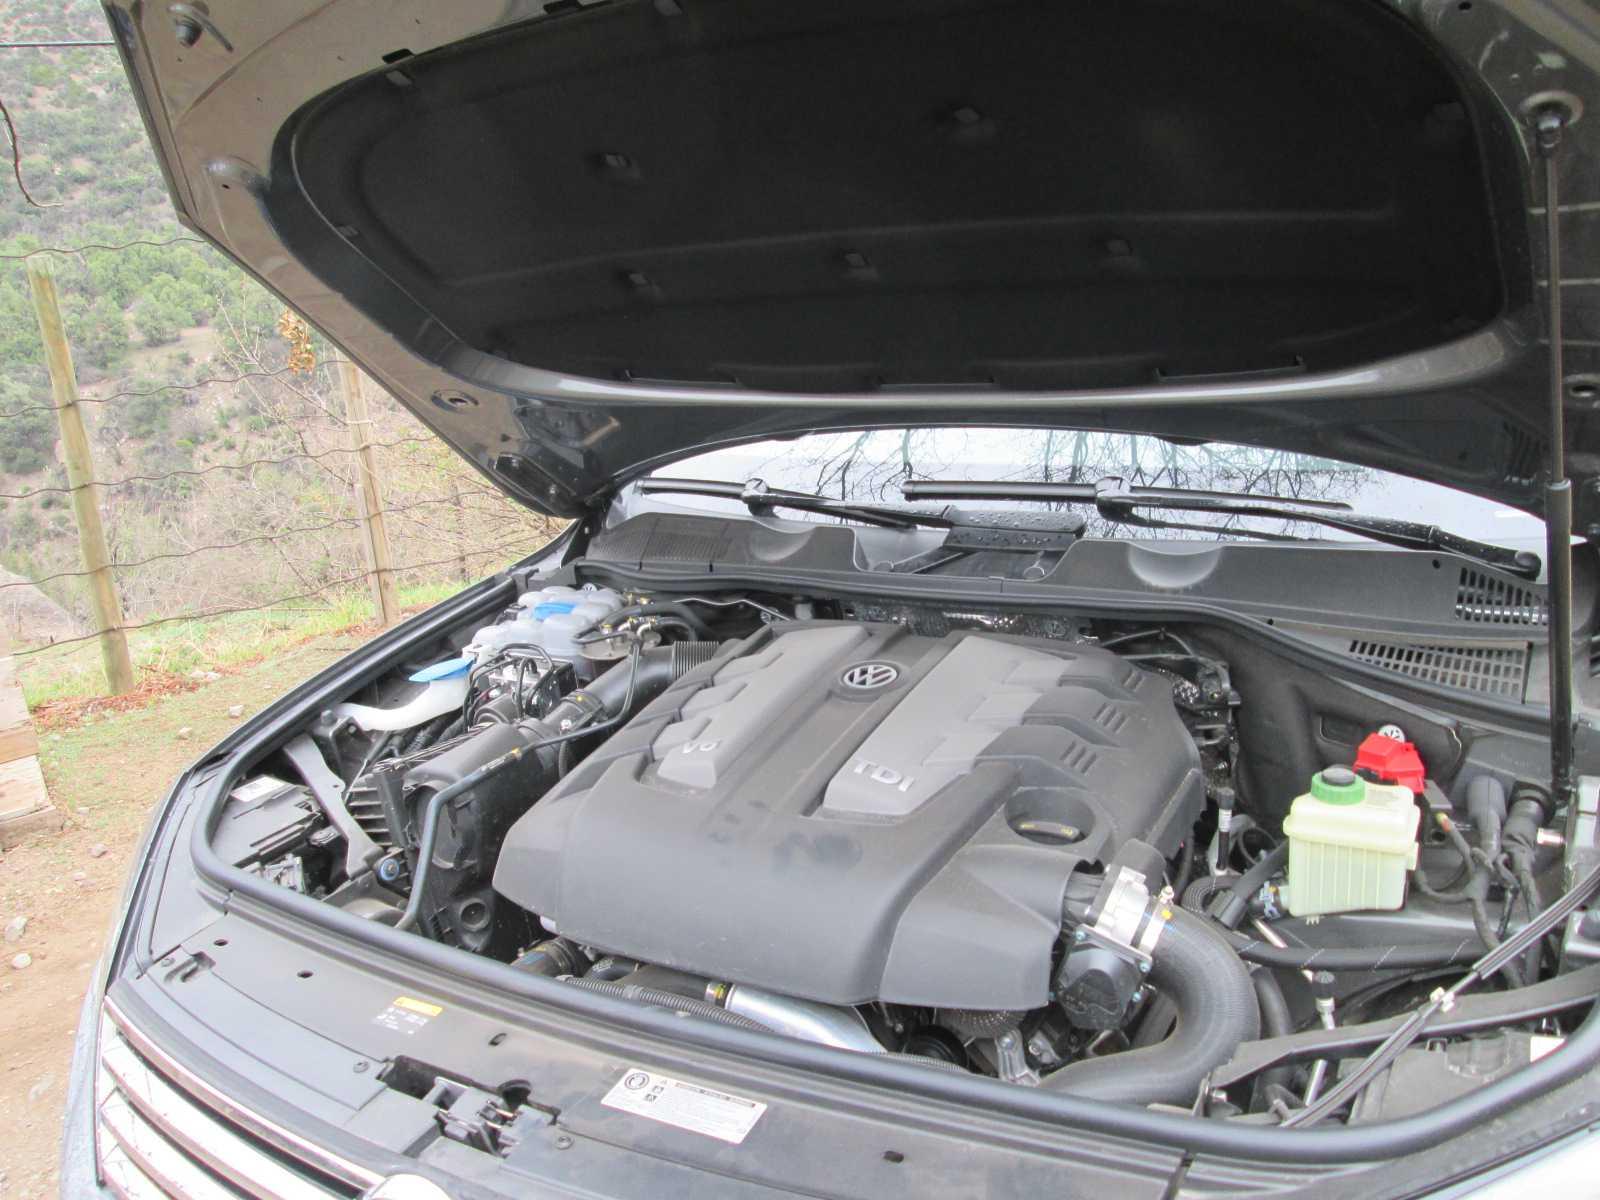 Volkswagen Touareg 3.0 TDI 2016 Test Drive Rutamotor (30)